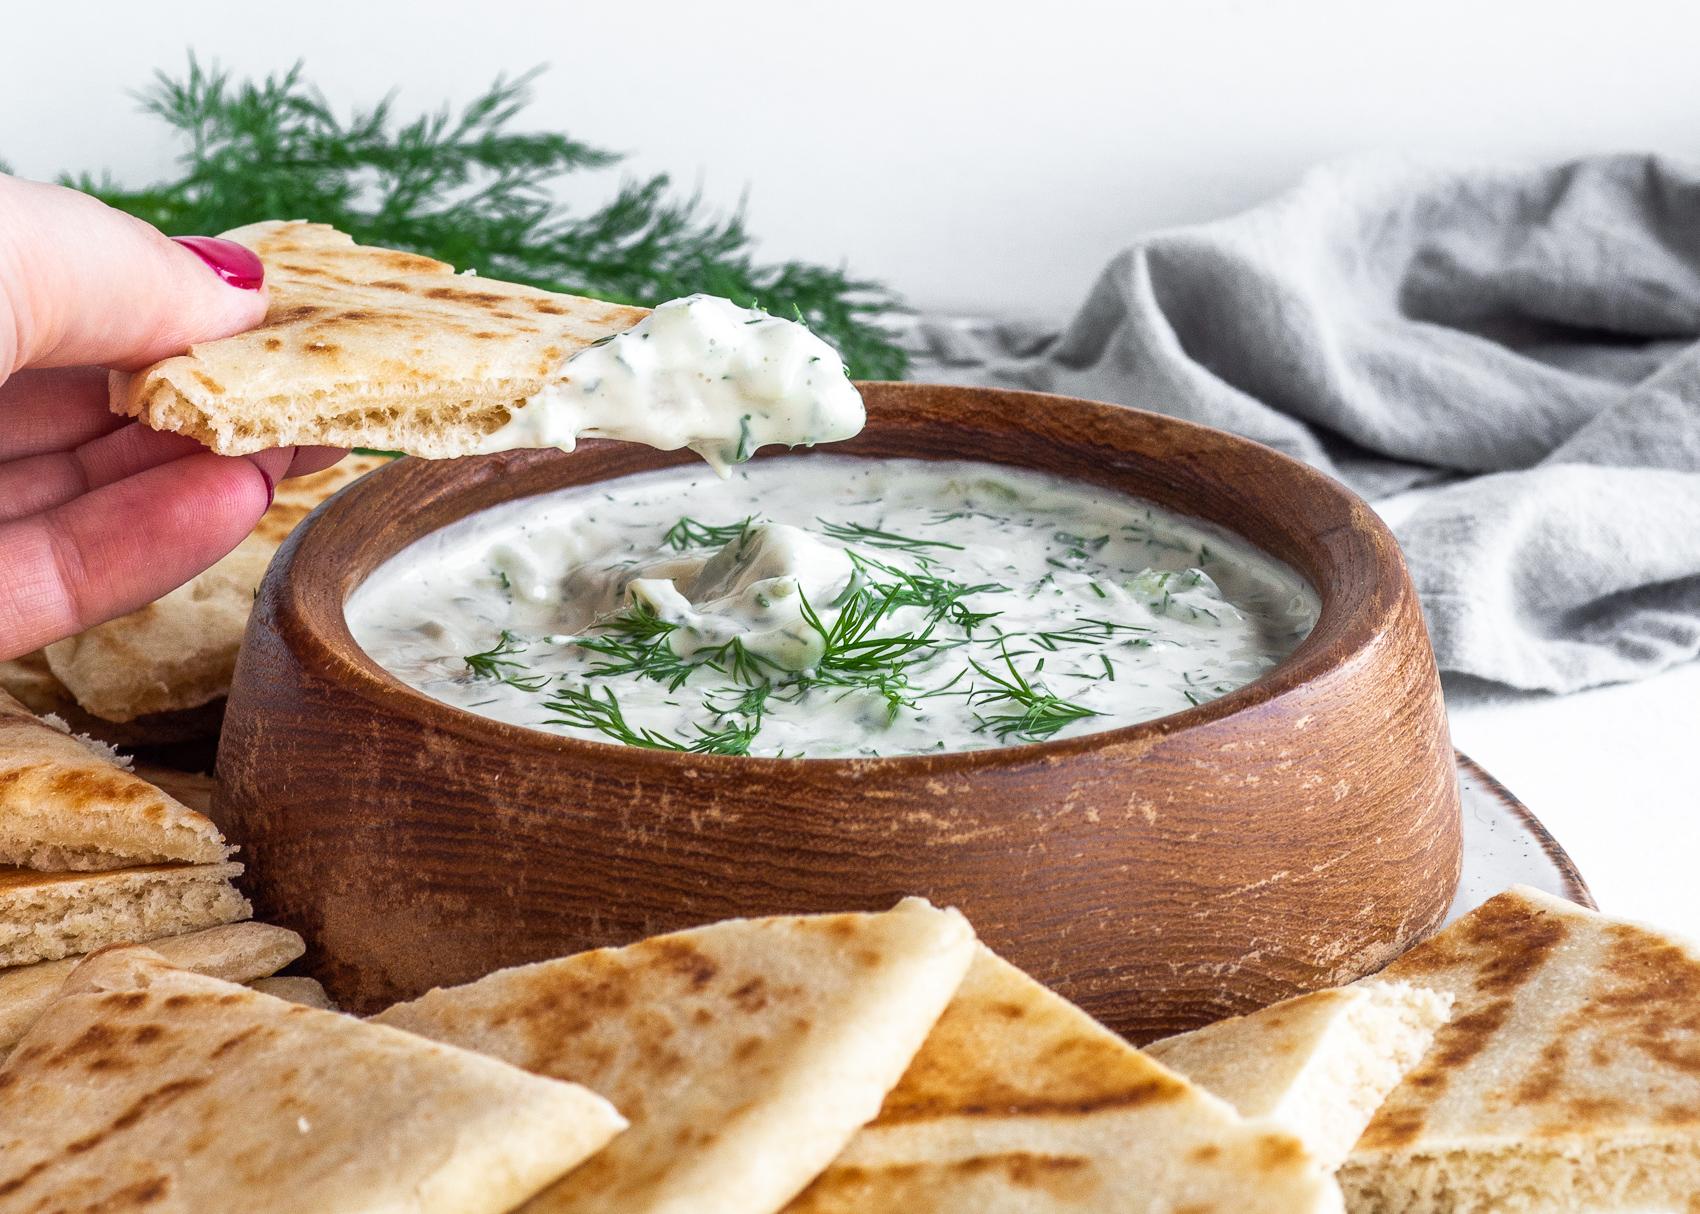 vegan tzatziki in wood bowl with hand dipping pita bread